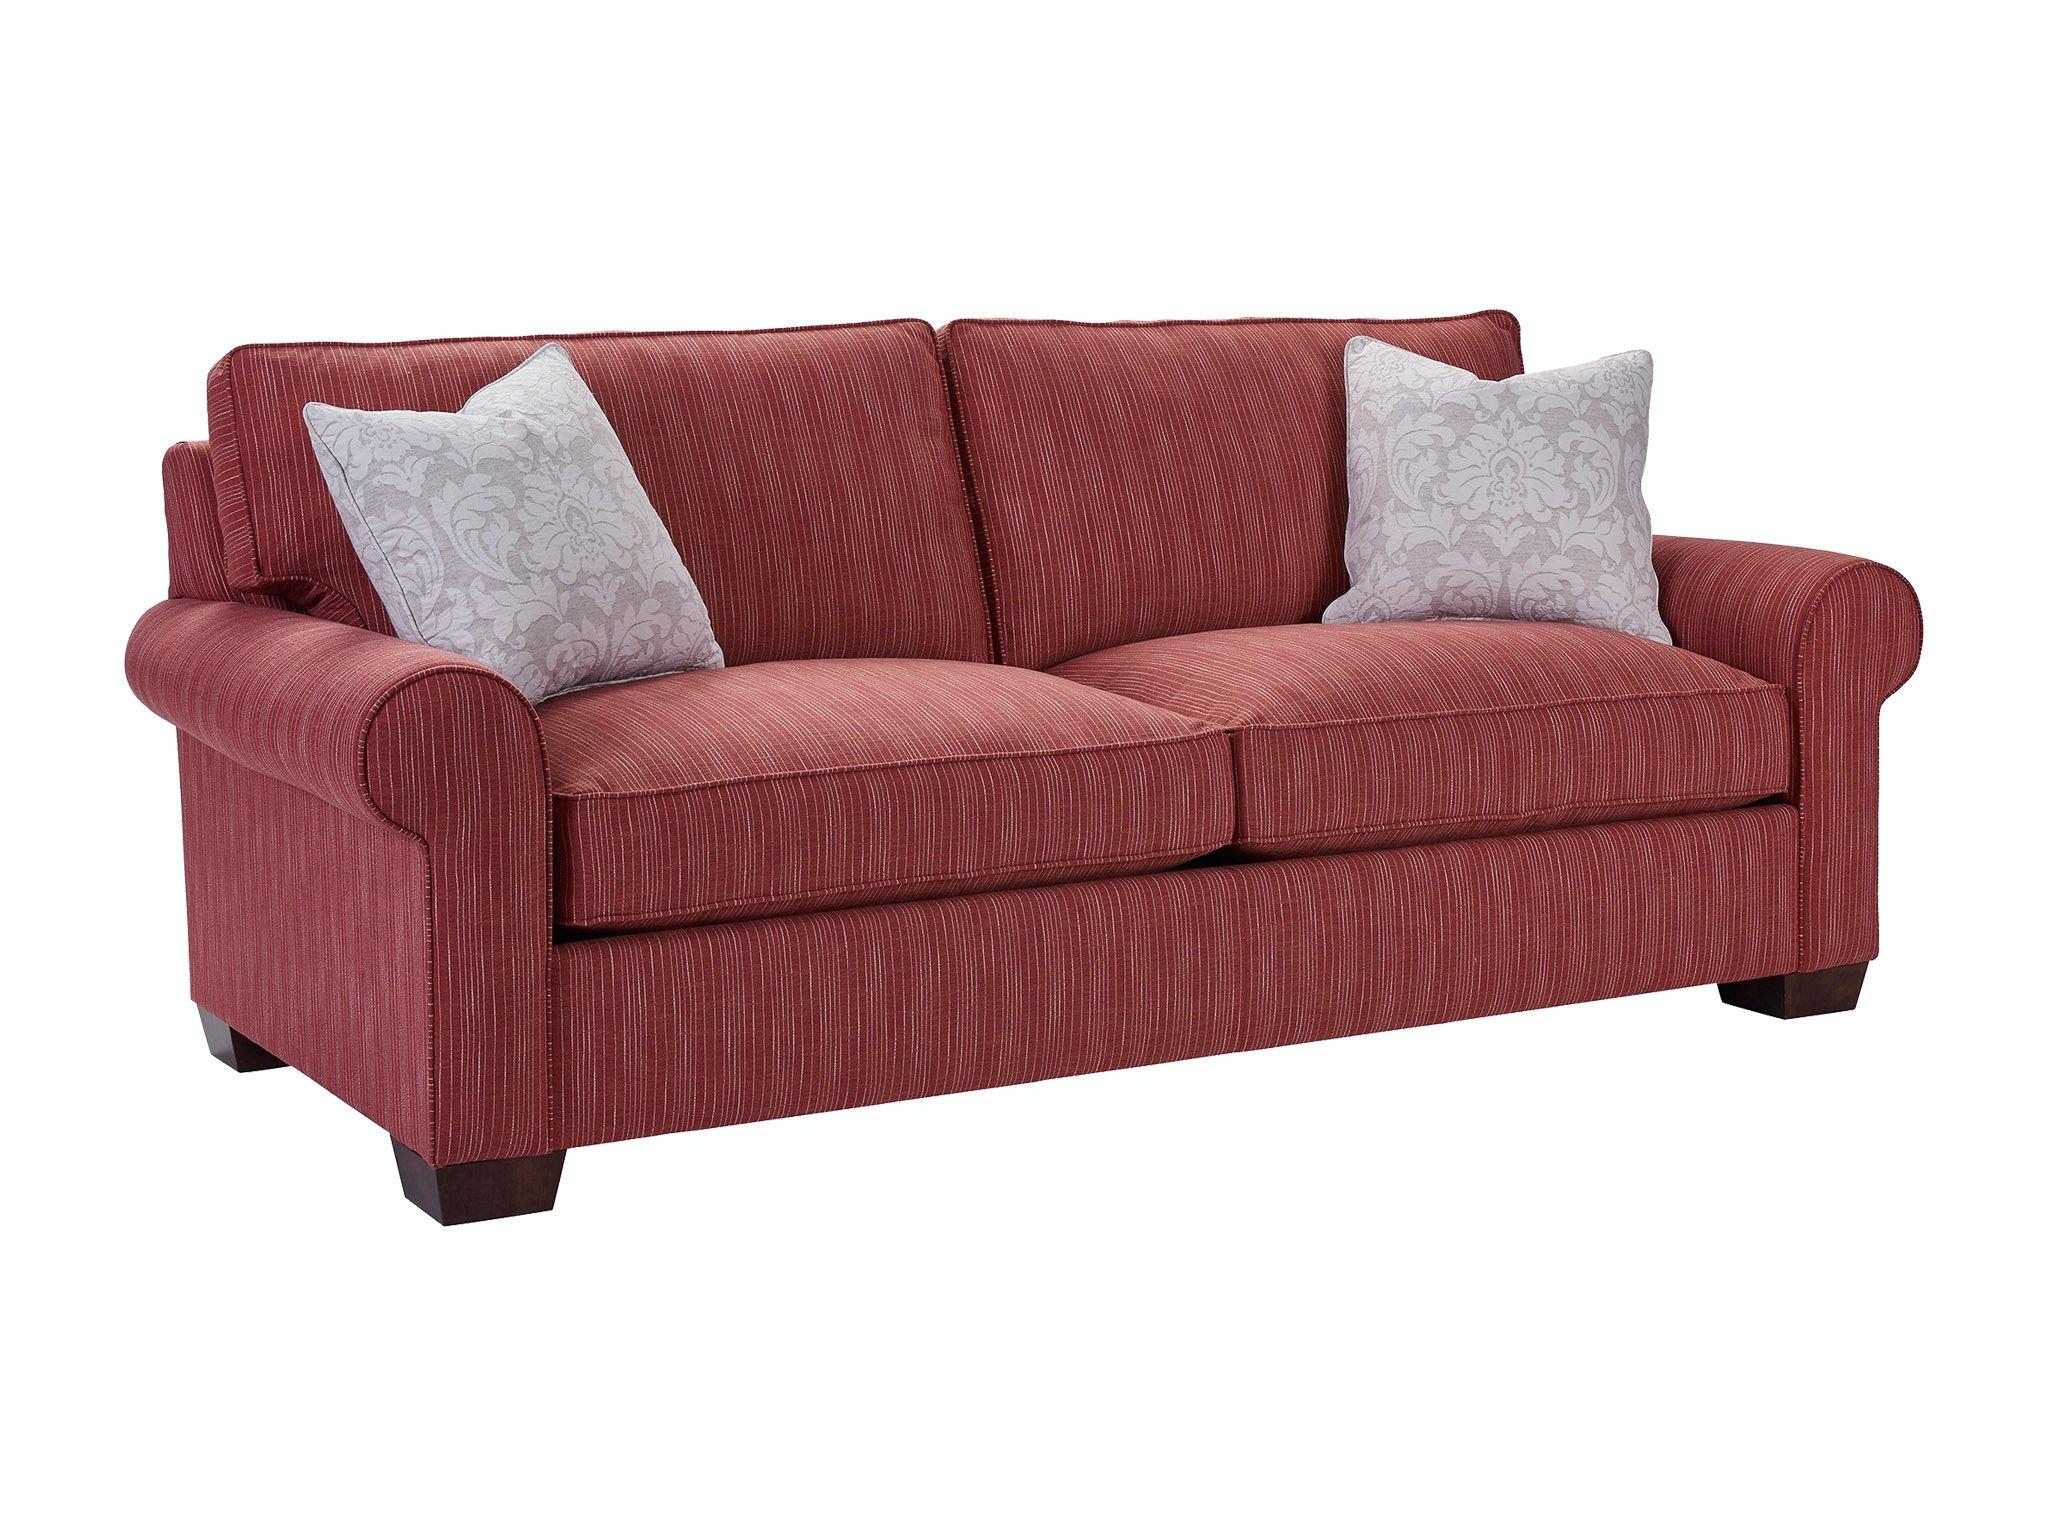 broyhill floral sofa beige color living room isadore 4272 2 waltman